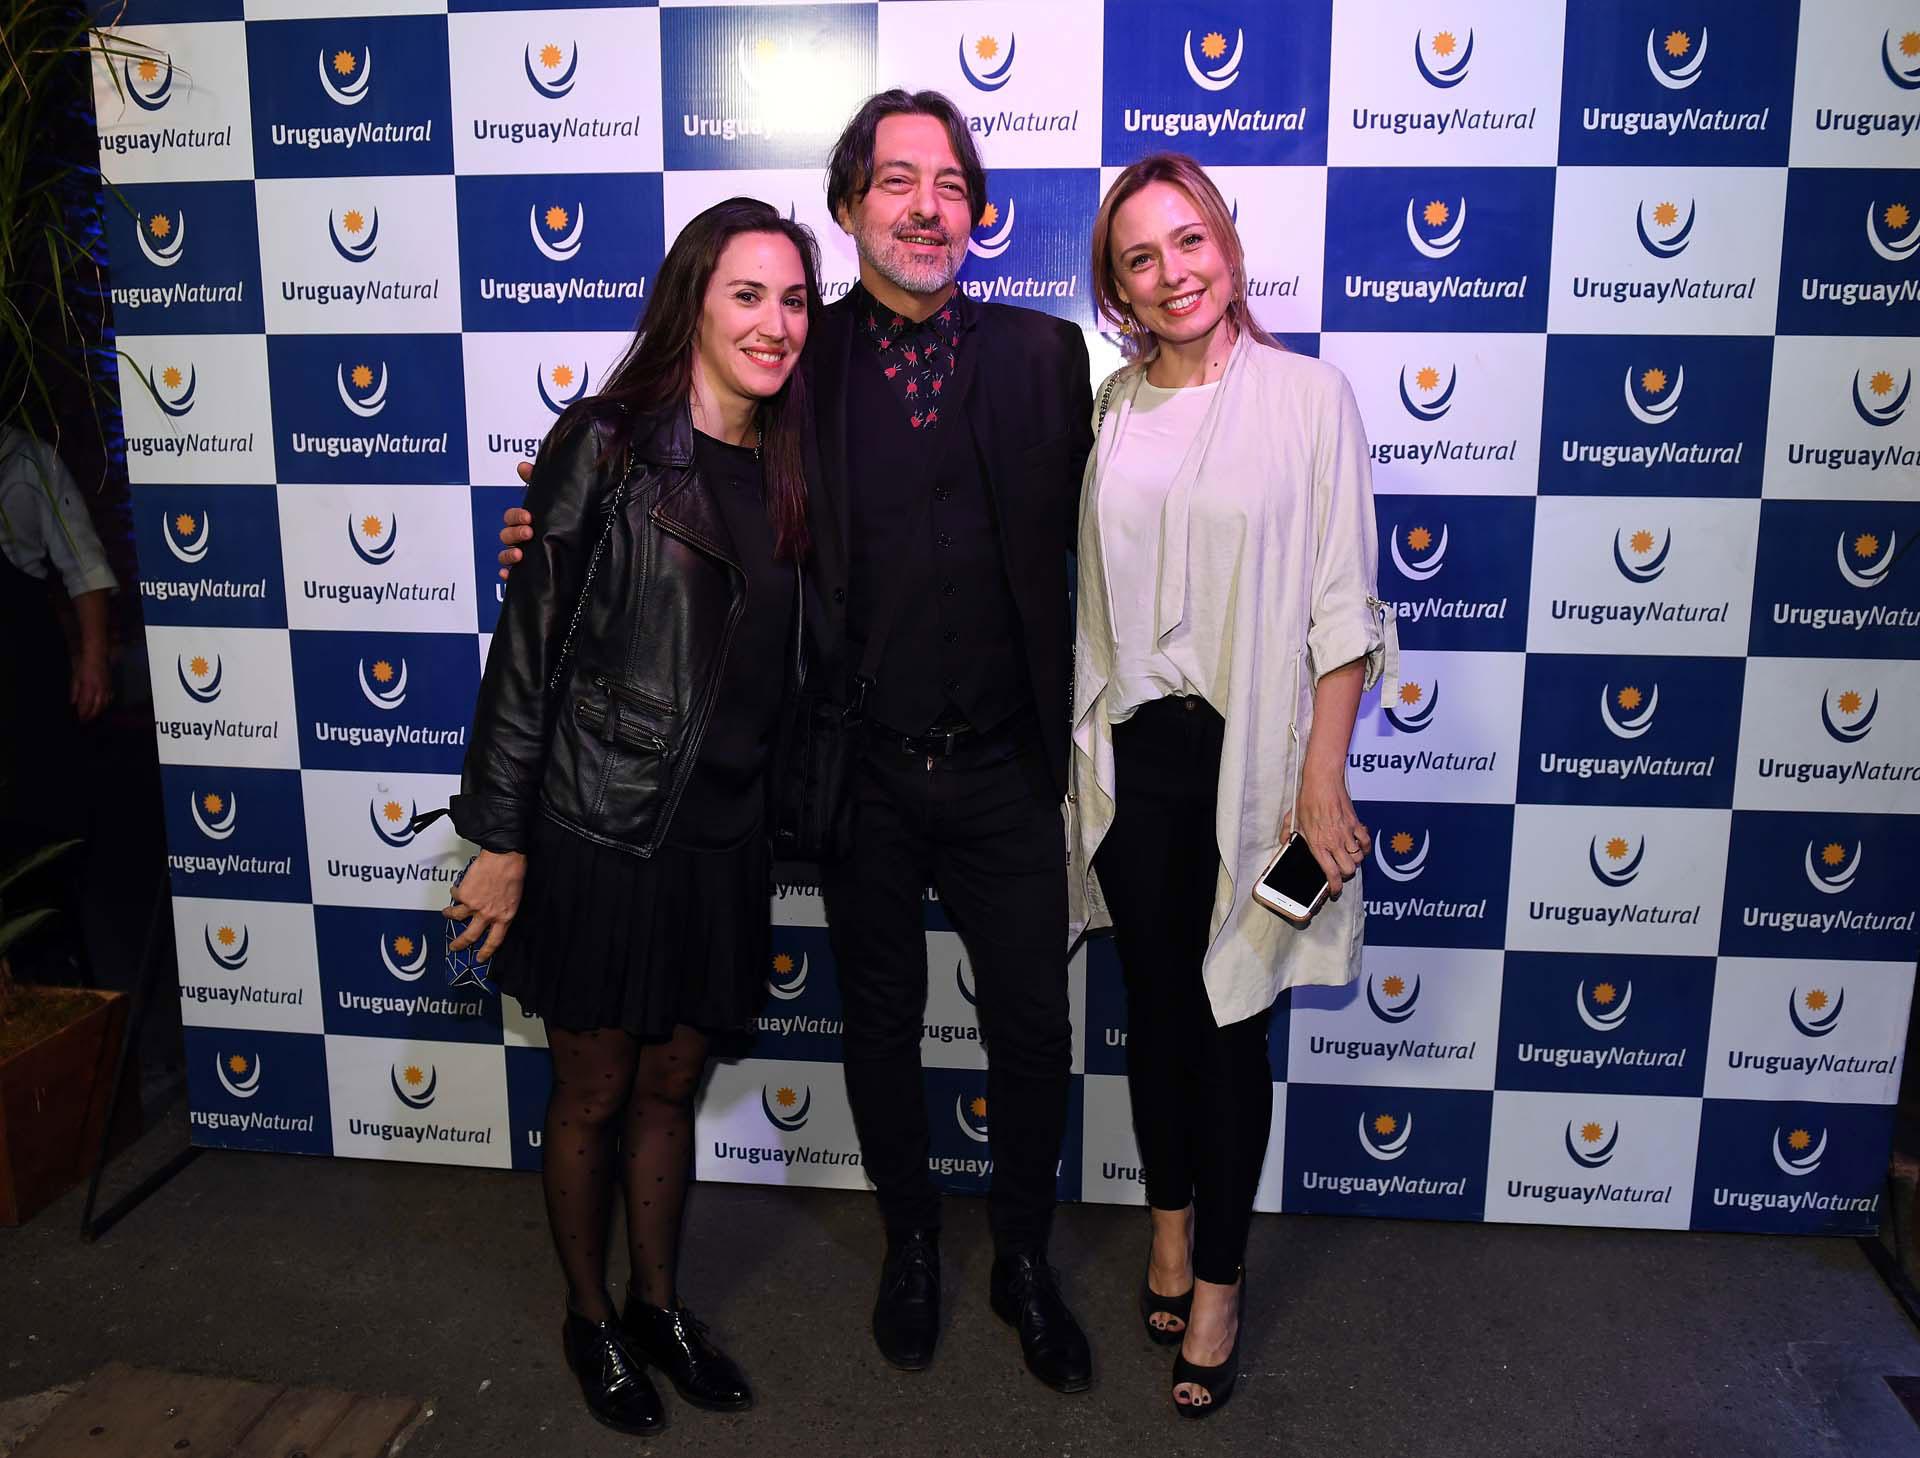 Malena Solda, Esteban Prol y Betina O'Connell